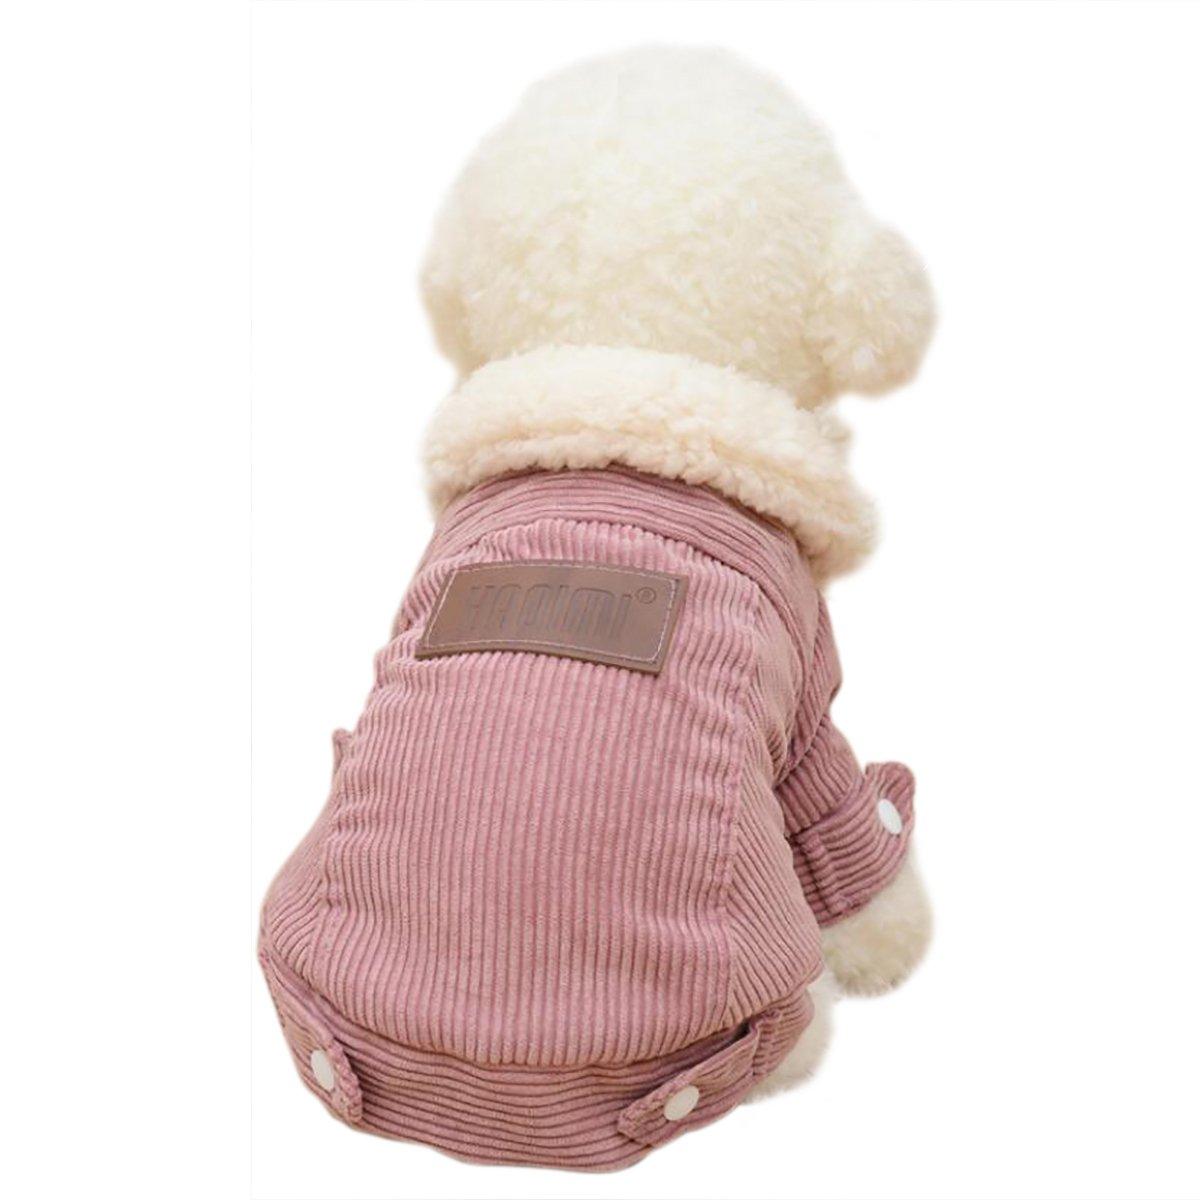 TenNen pet wear Fuyugi small dogs New Year Dog clothes medium-sized dog warm coat birthday cat clothes fashionable jacket (XL pink)